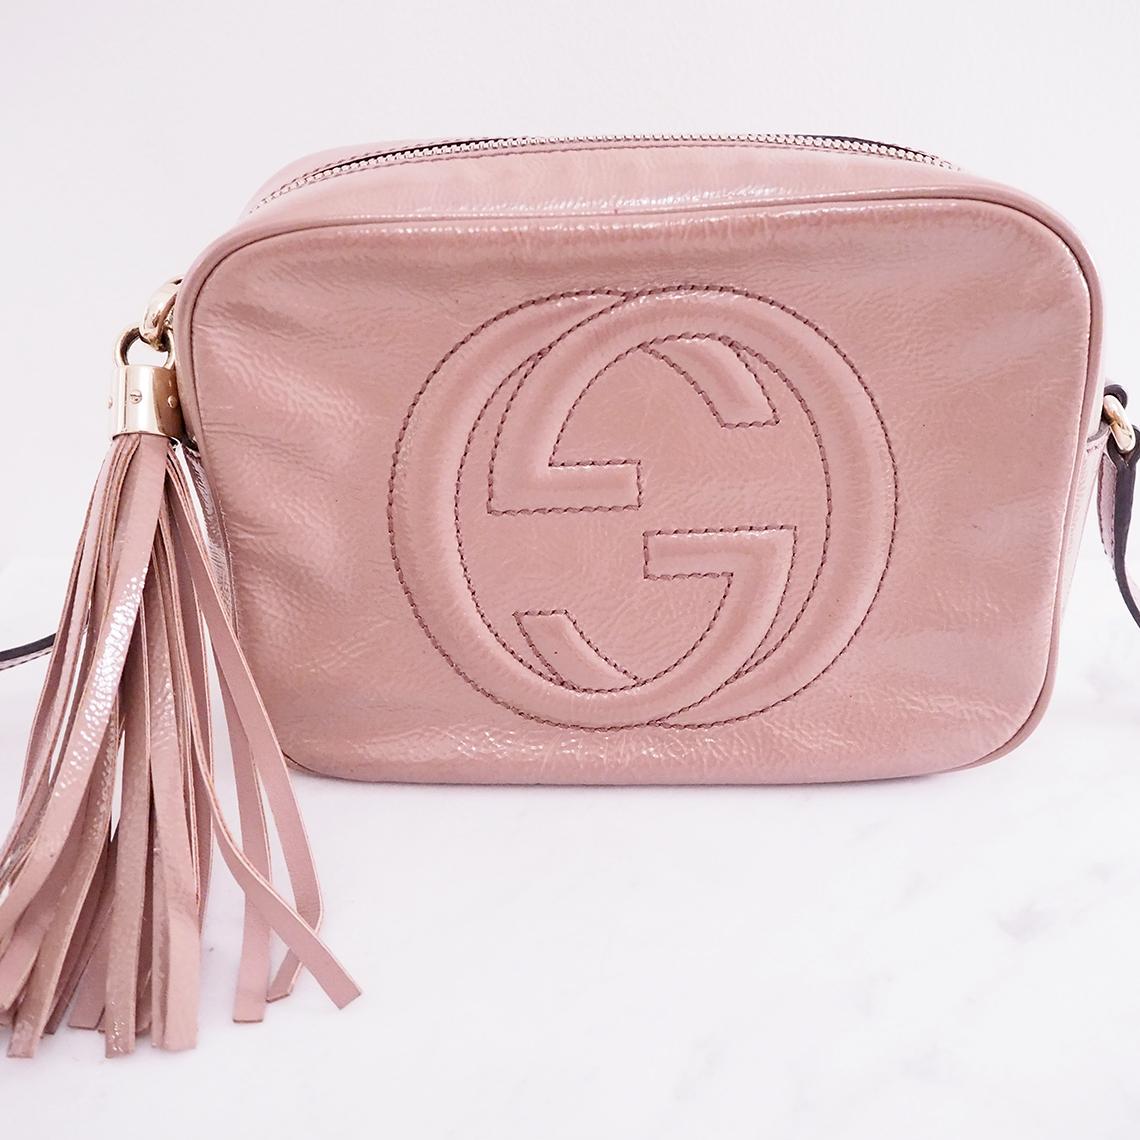 Gucci 'Soho' Disco Bag